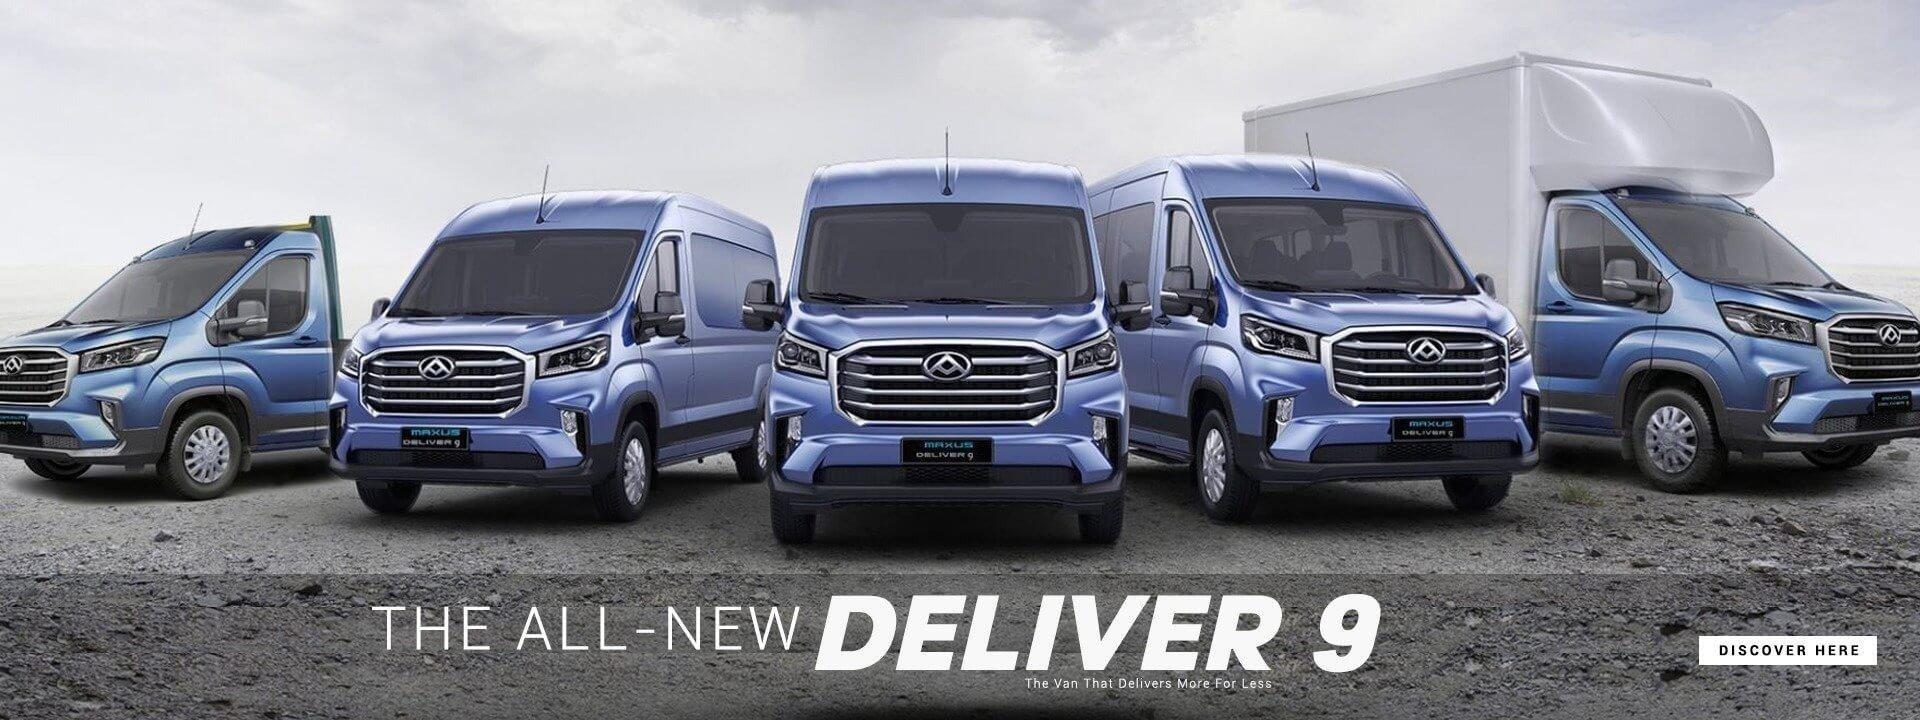 Carwise LDV - New Deliver 9